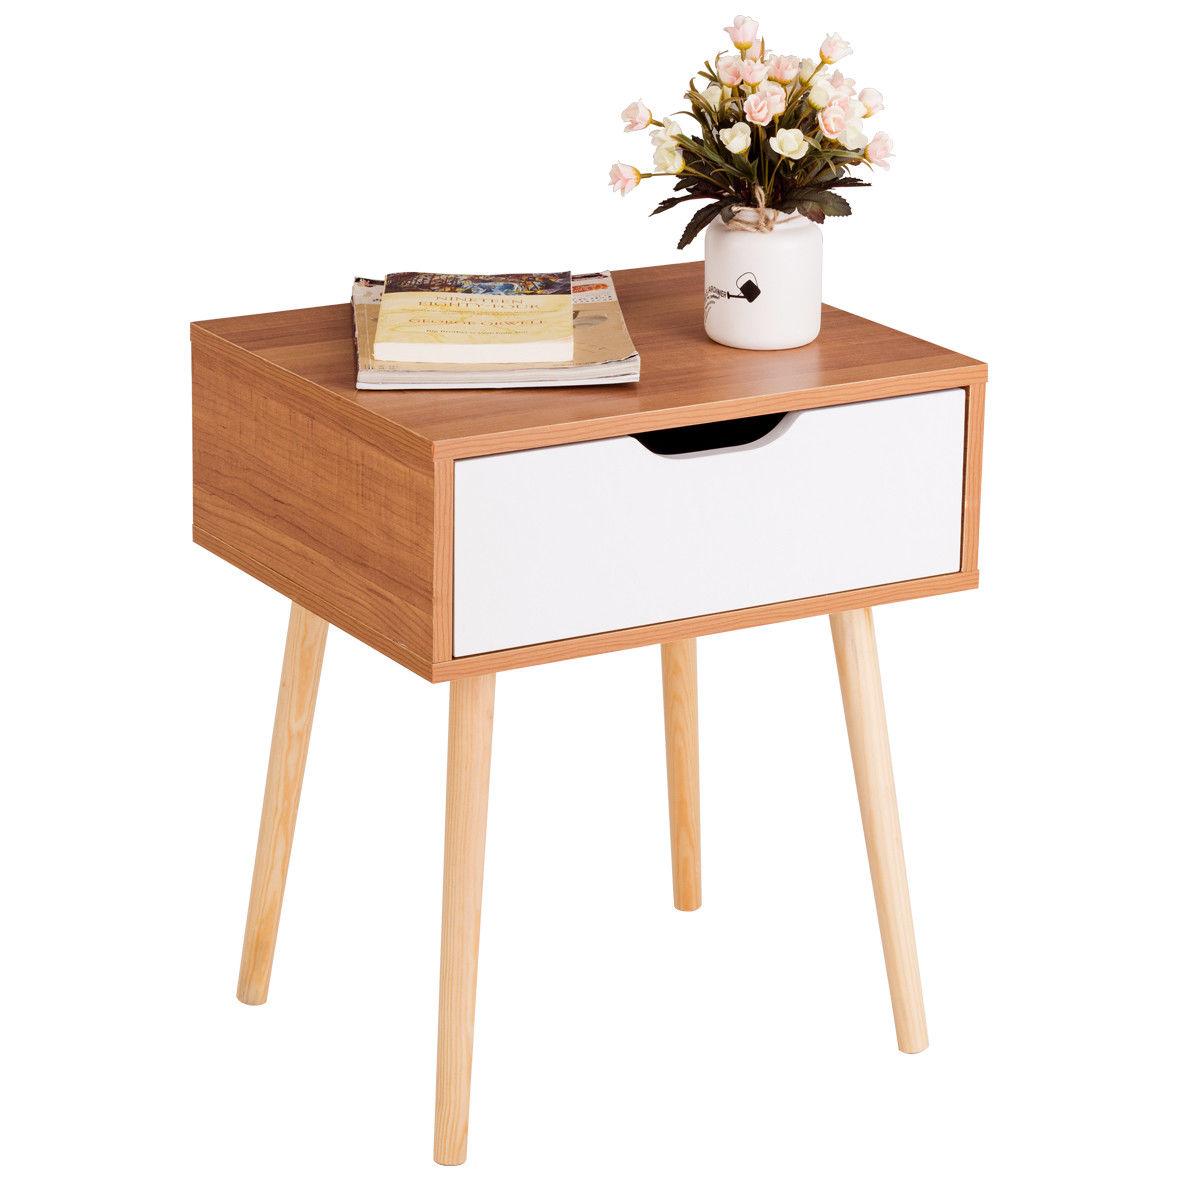 Costway Nightstand End Side Sofa Table Storage Drawer Living Room Furni W Solid Wood Leg